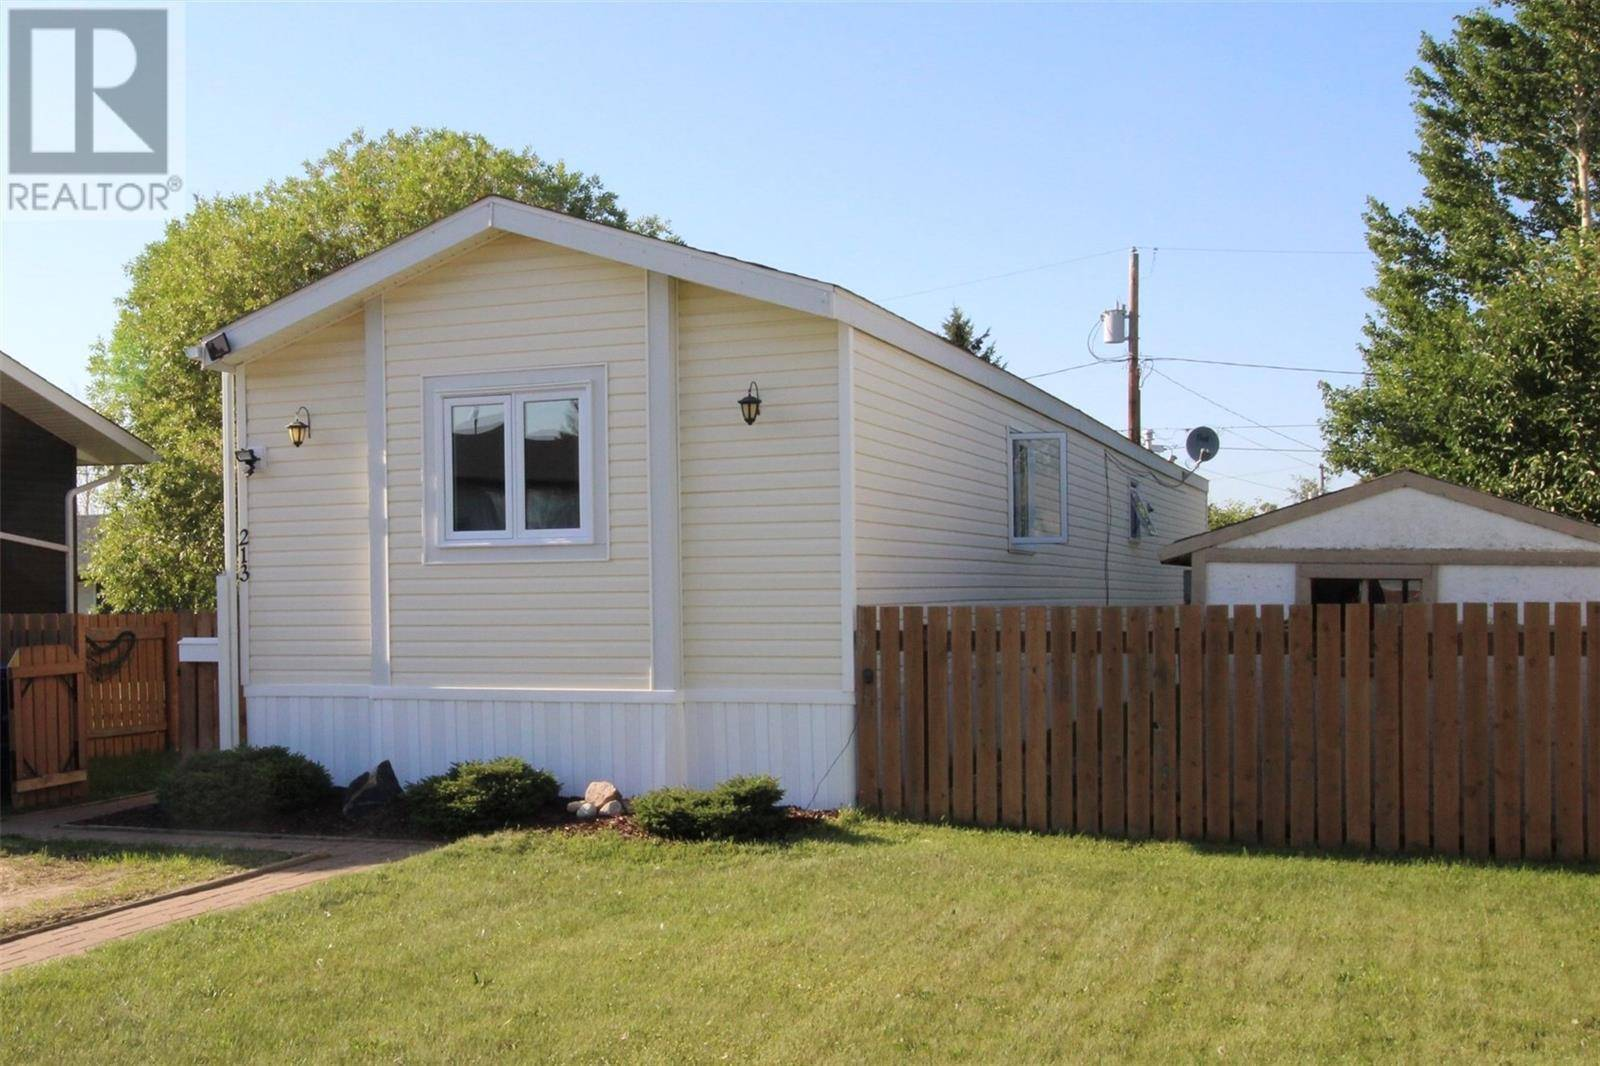 Residential property for sale at 213 3rd St W Langham Saskatchewan - MLS: SK781691